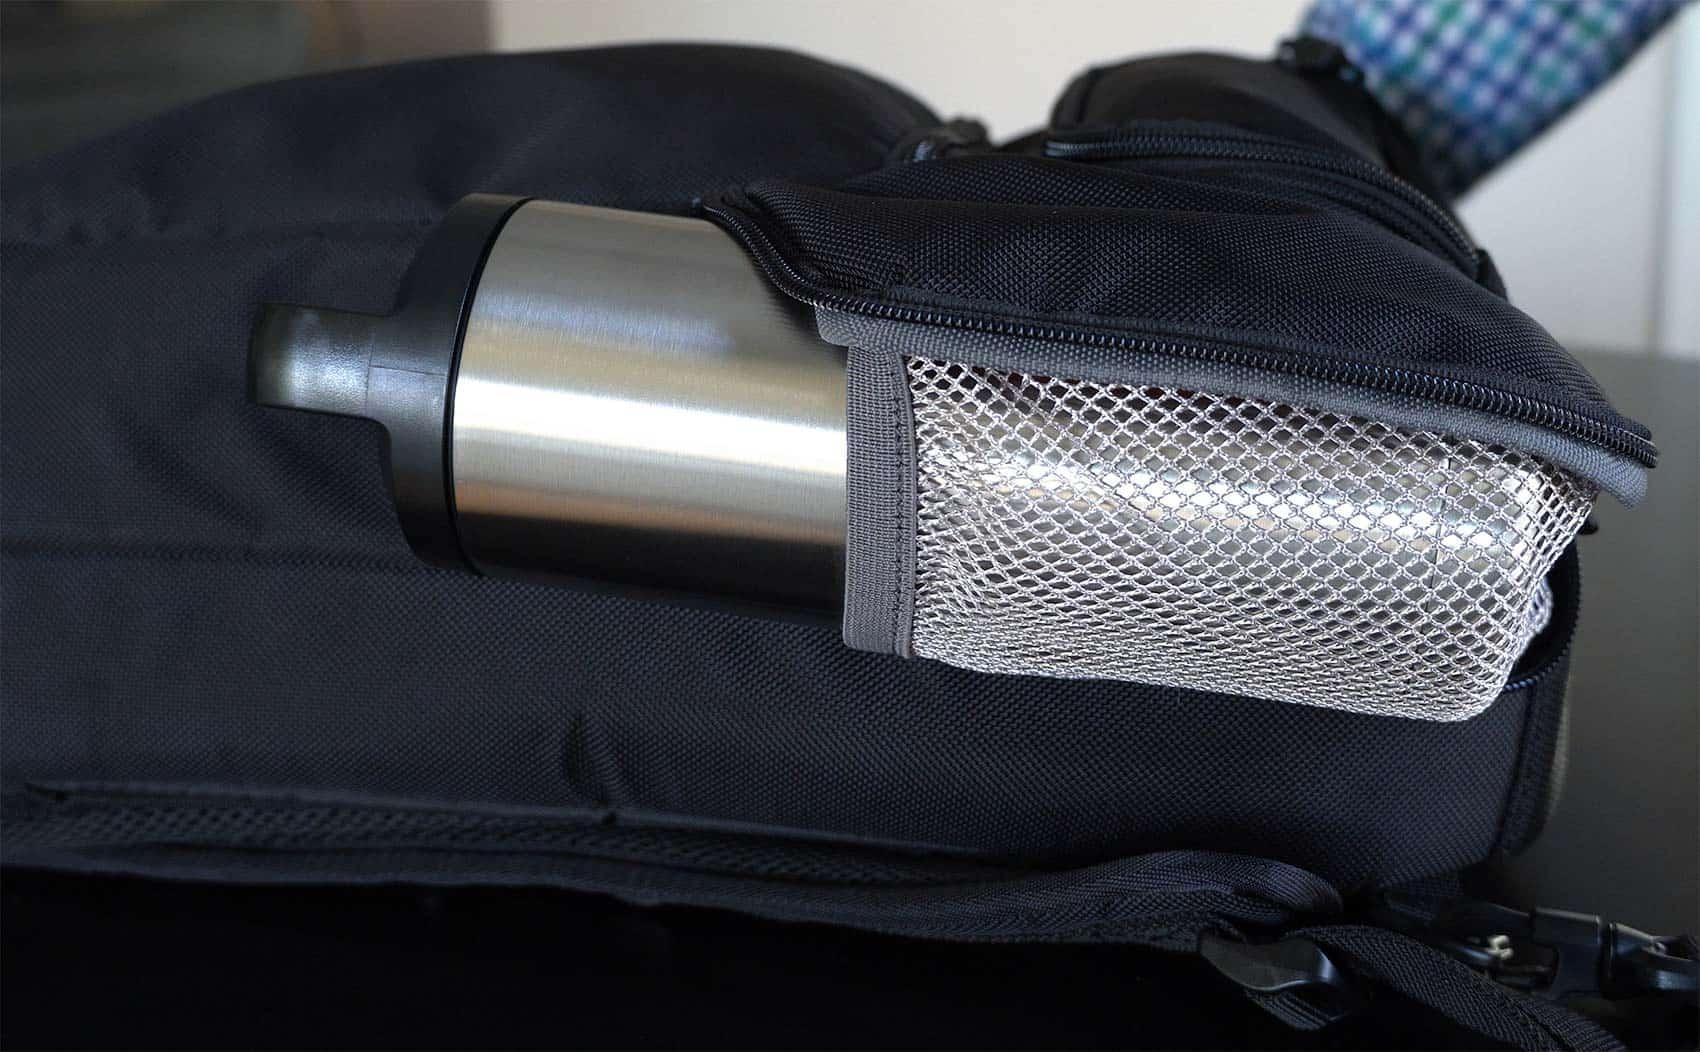 ebags slim laptop backpack review